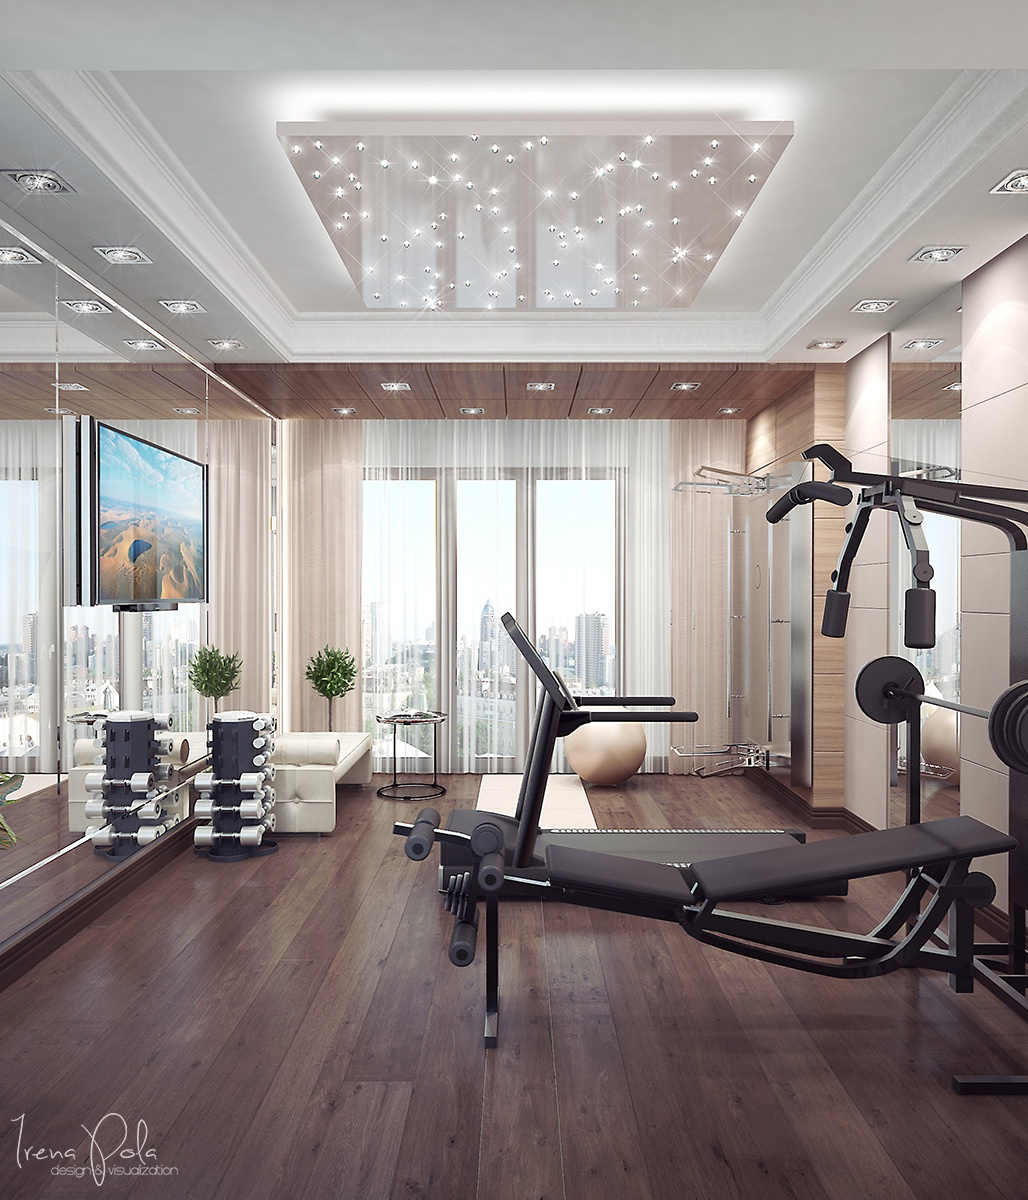 Interior Design Ideas For Home Gym: Super Luxurious Apartment In Kiev, Ukraine